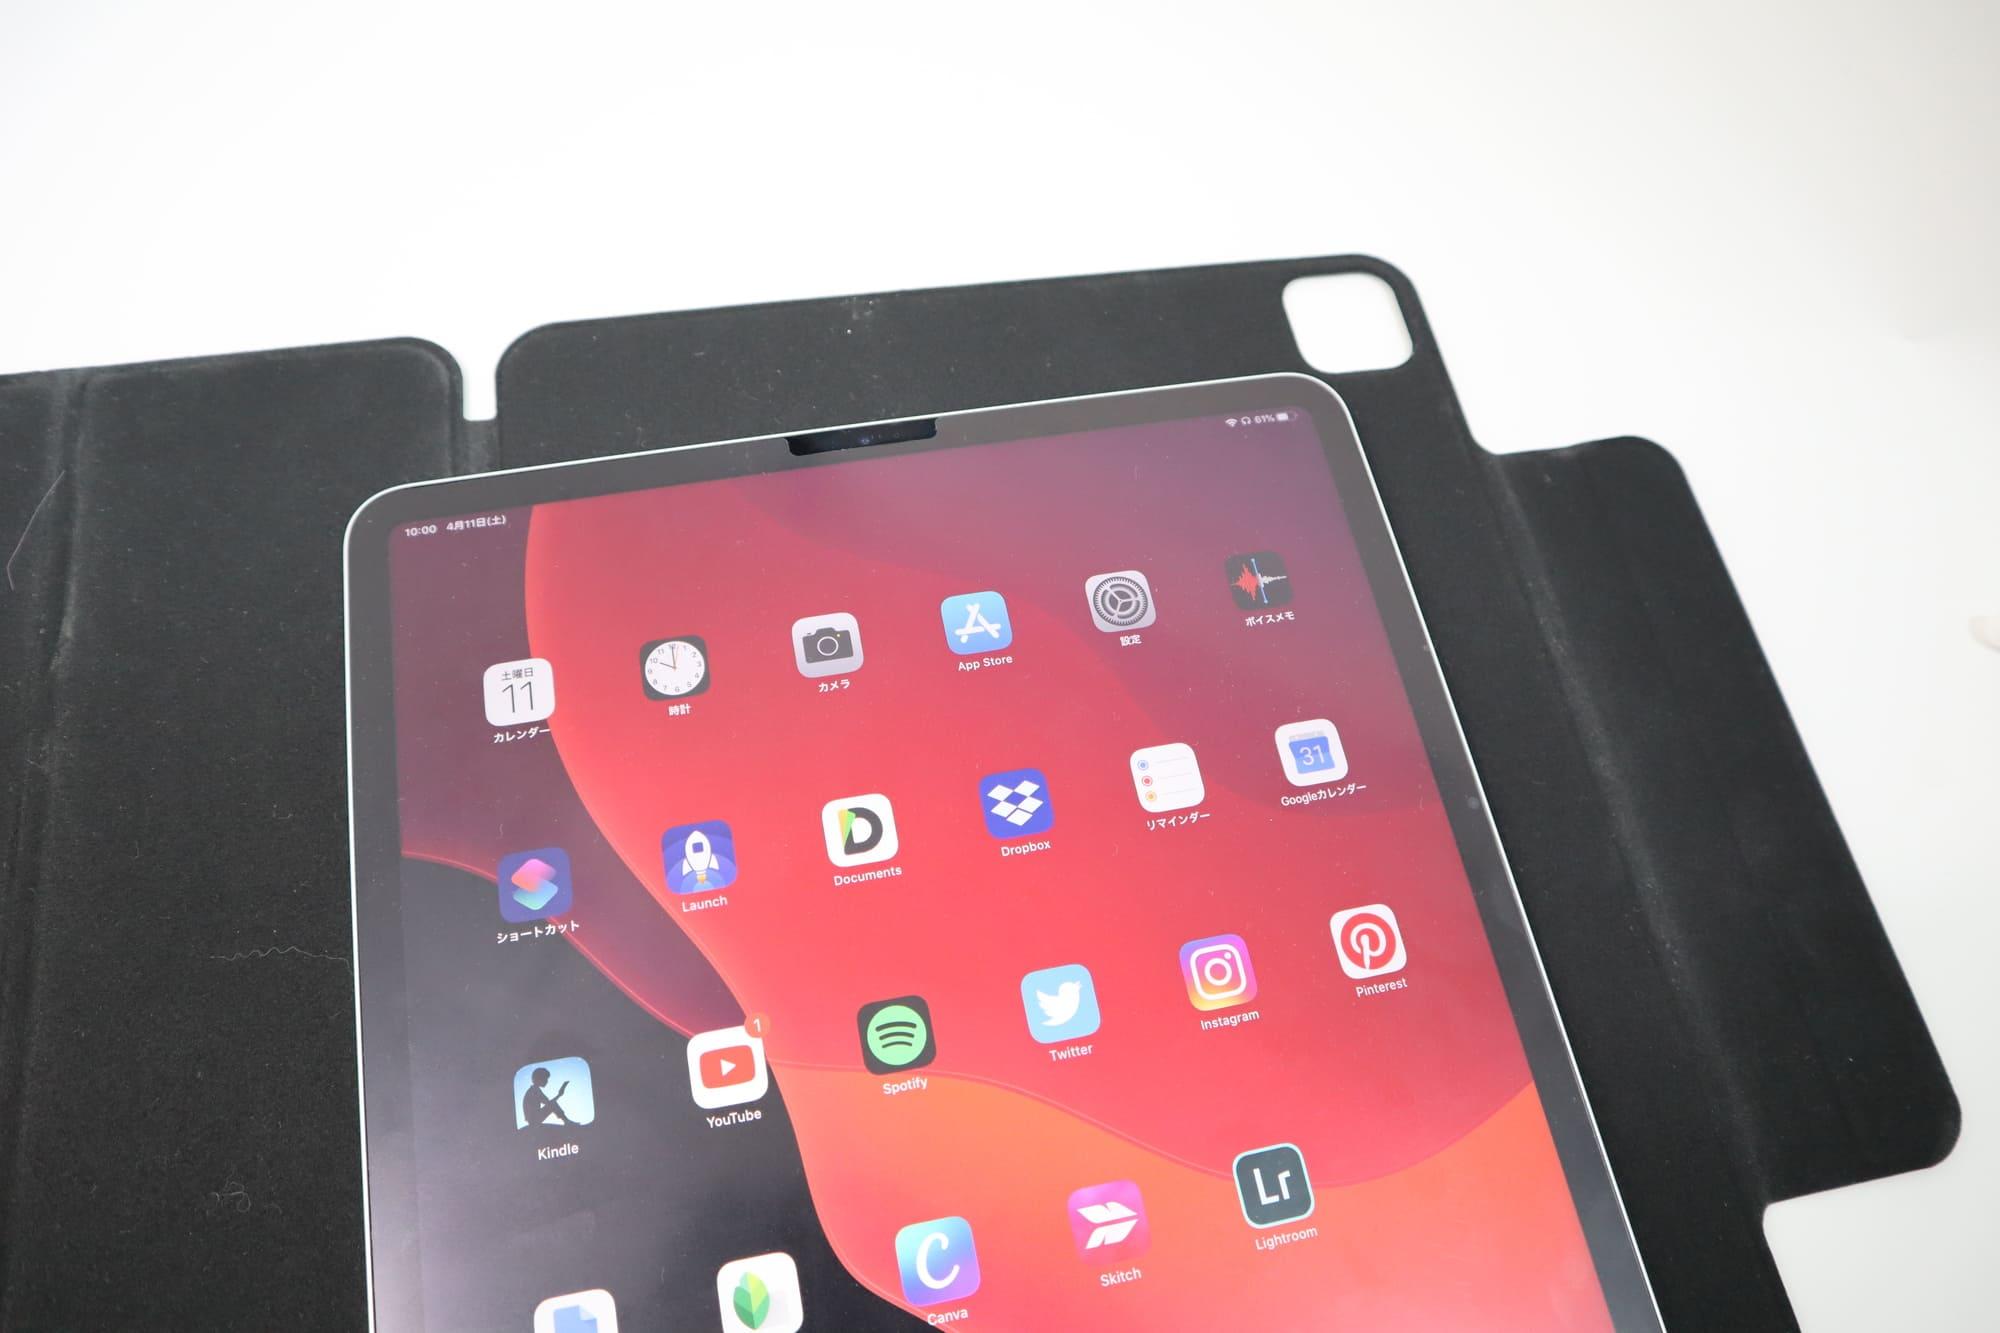 ESRのiPad Pro用ケースはマグネット式で脱着可能